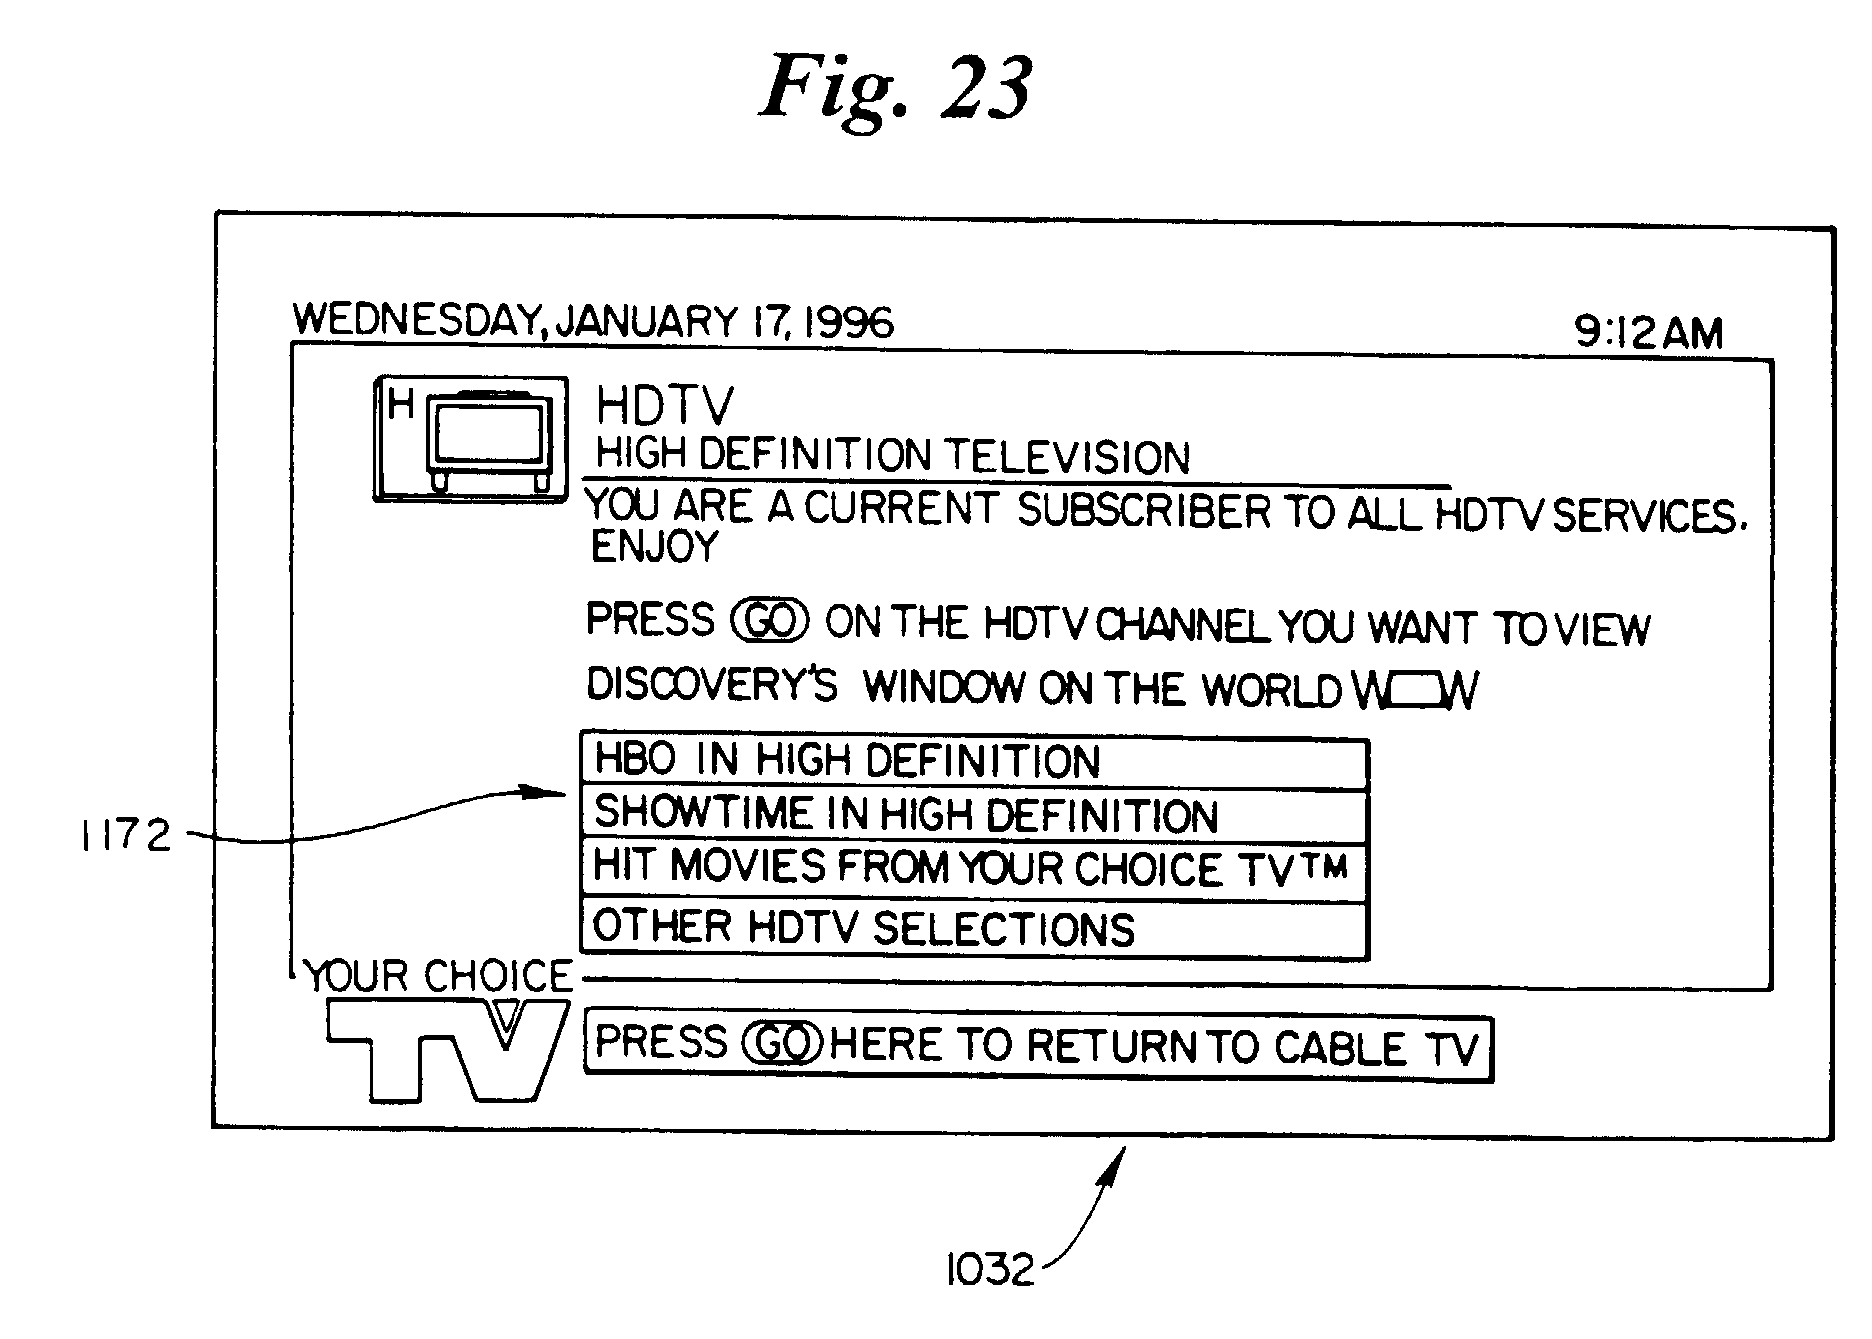 Ep0910218a2 Tonprogrammempfngerendgert Fr Fernsehverteilsystem Alliance Hd 73 Antenna Rotor With Control 2 Sets Of Google Patents